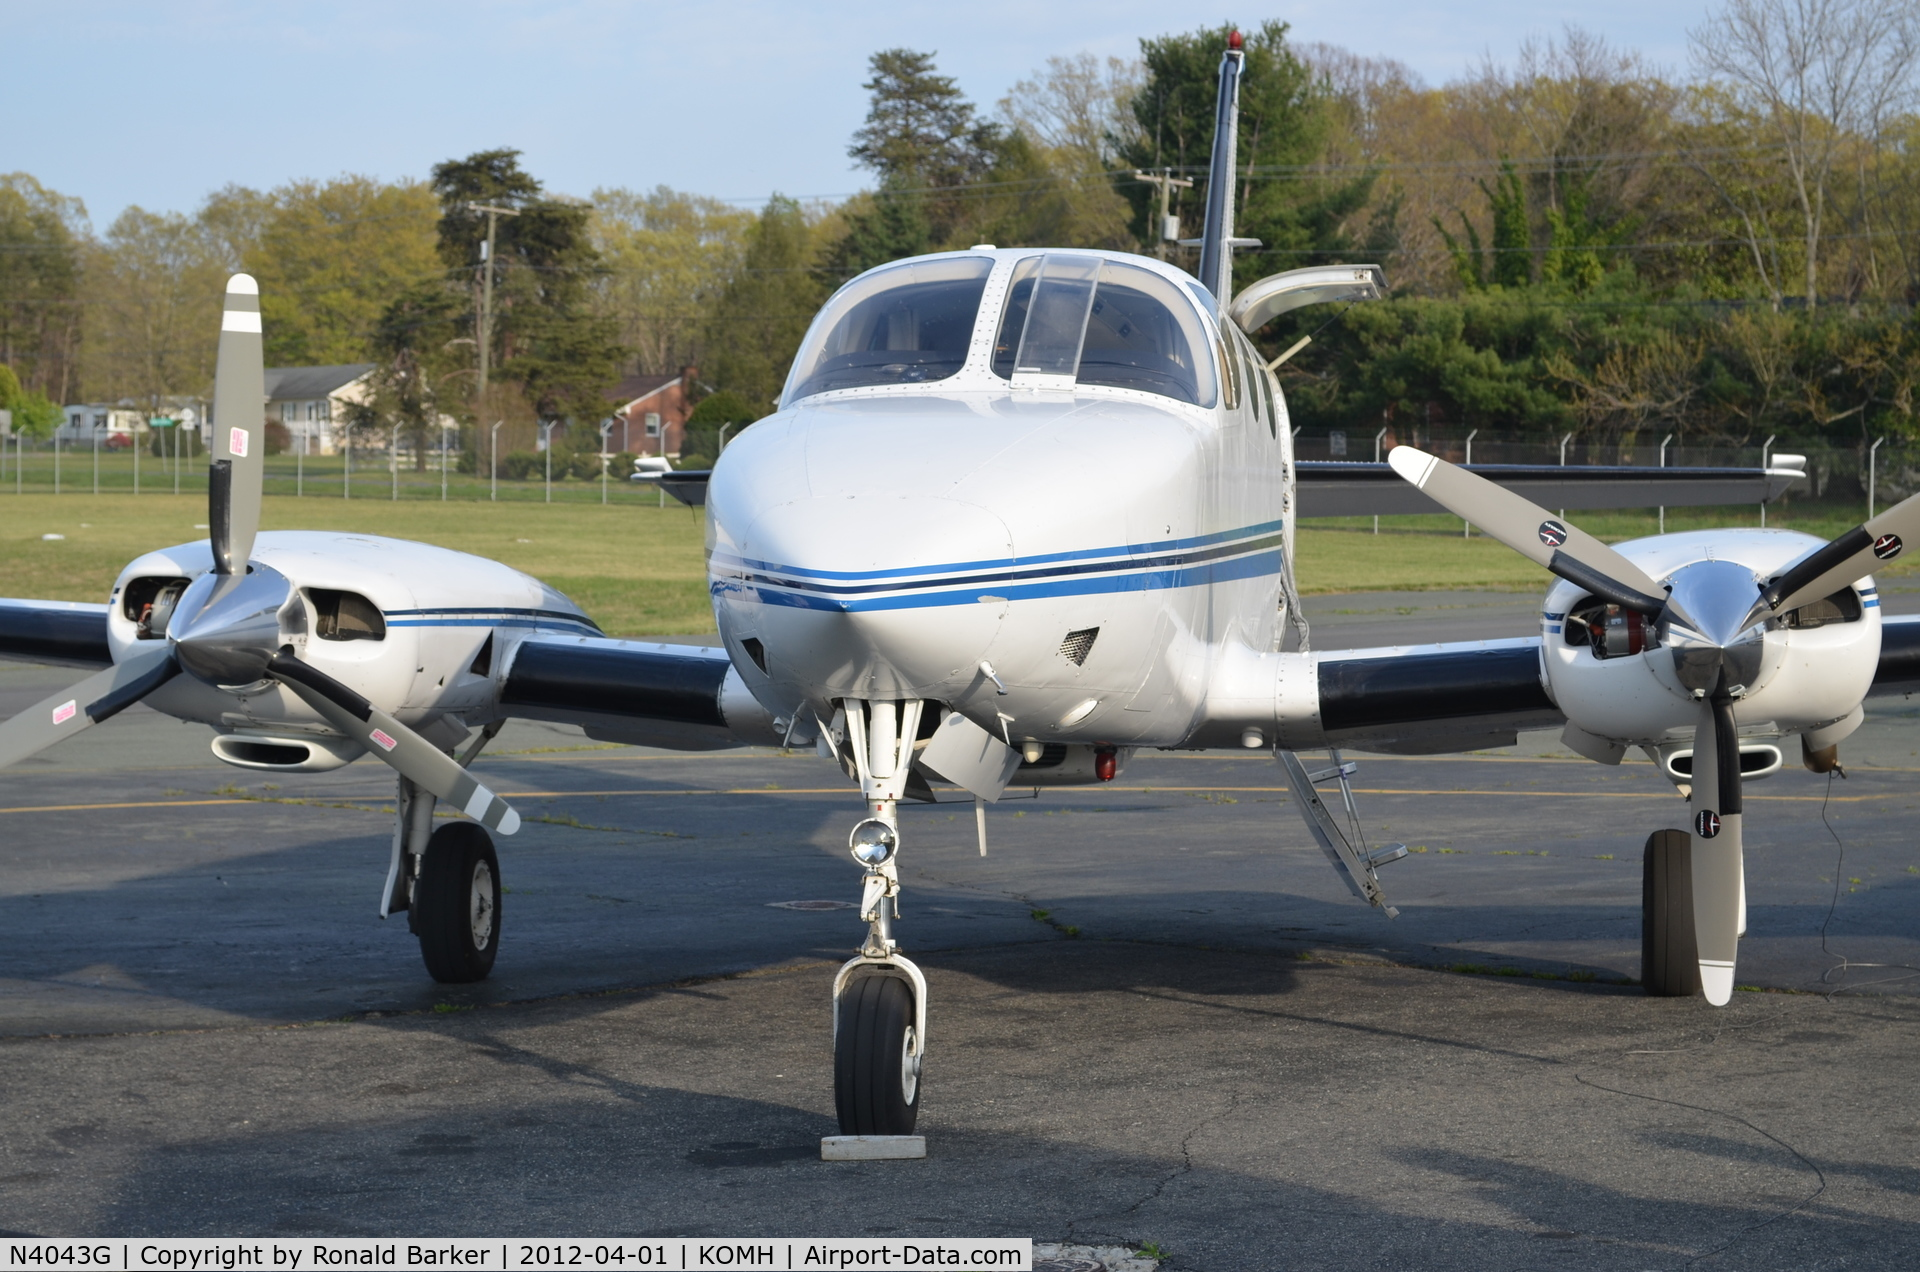 N4043G, 1977 Cessna 340A C/N 340A0266, Orange